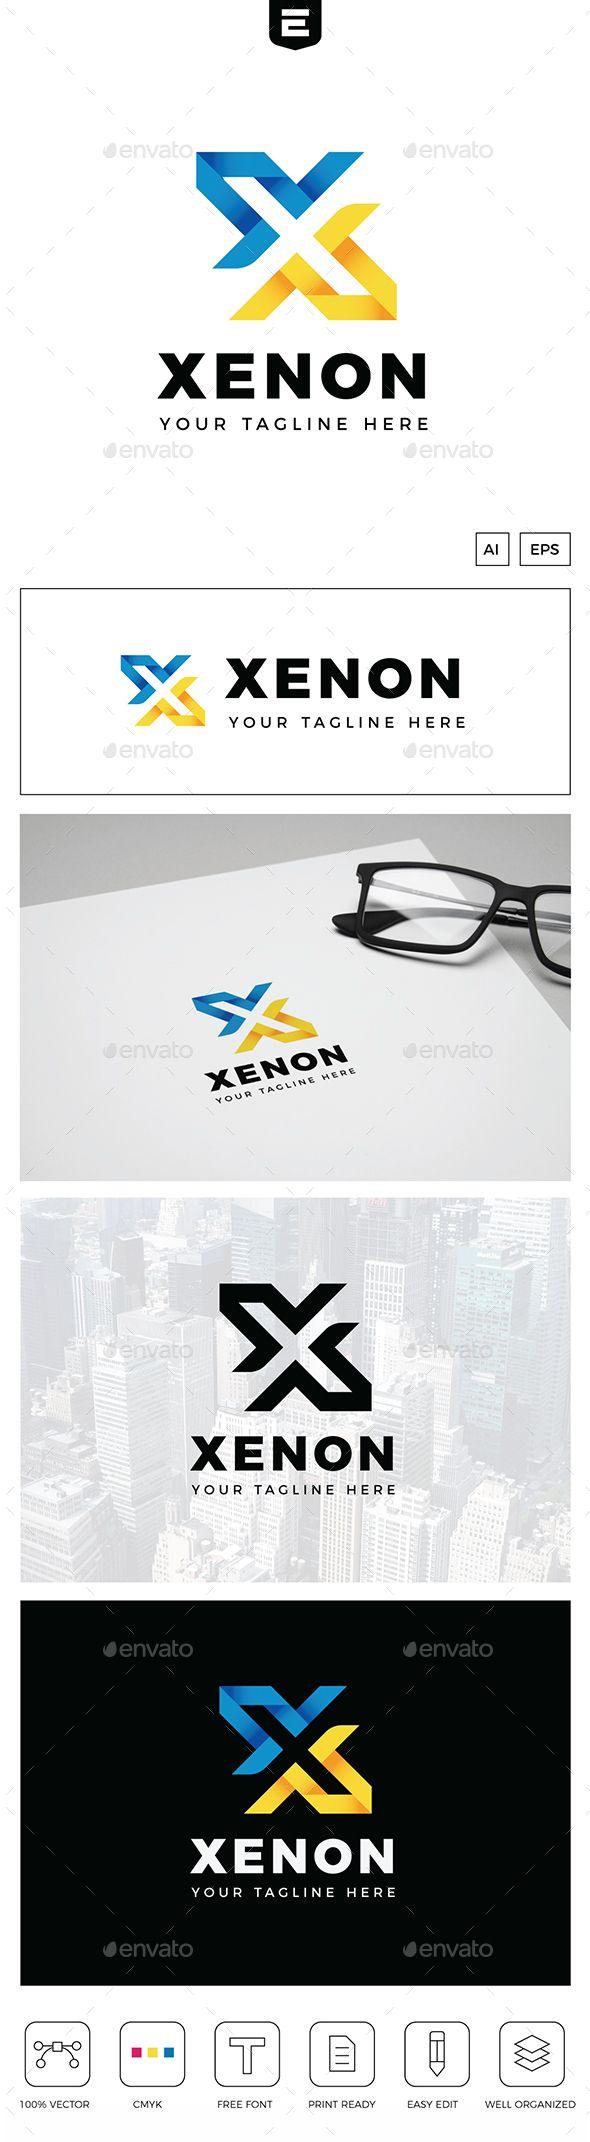 Xenon letter  logo template vector eps ai illustrator download pinterest templates logos and design also rh